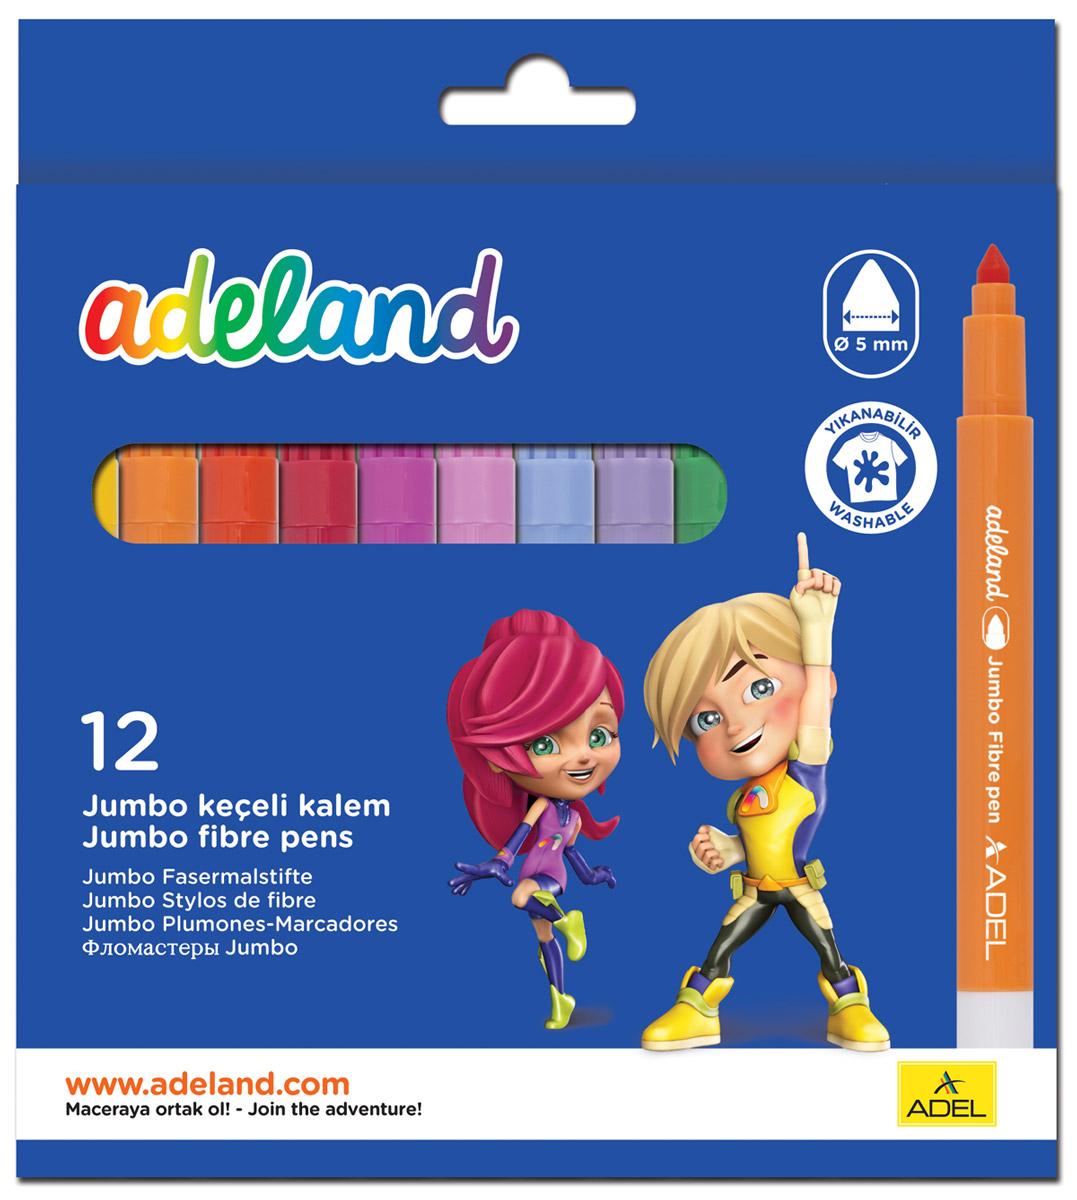 Adel Набор цветных фломастеров Adeland Jumbo 12 шт 434-0214-100